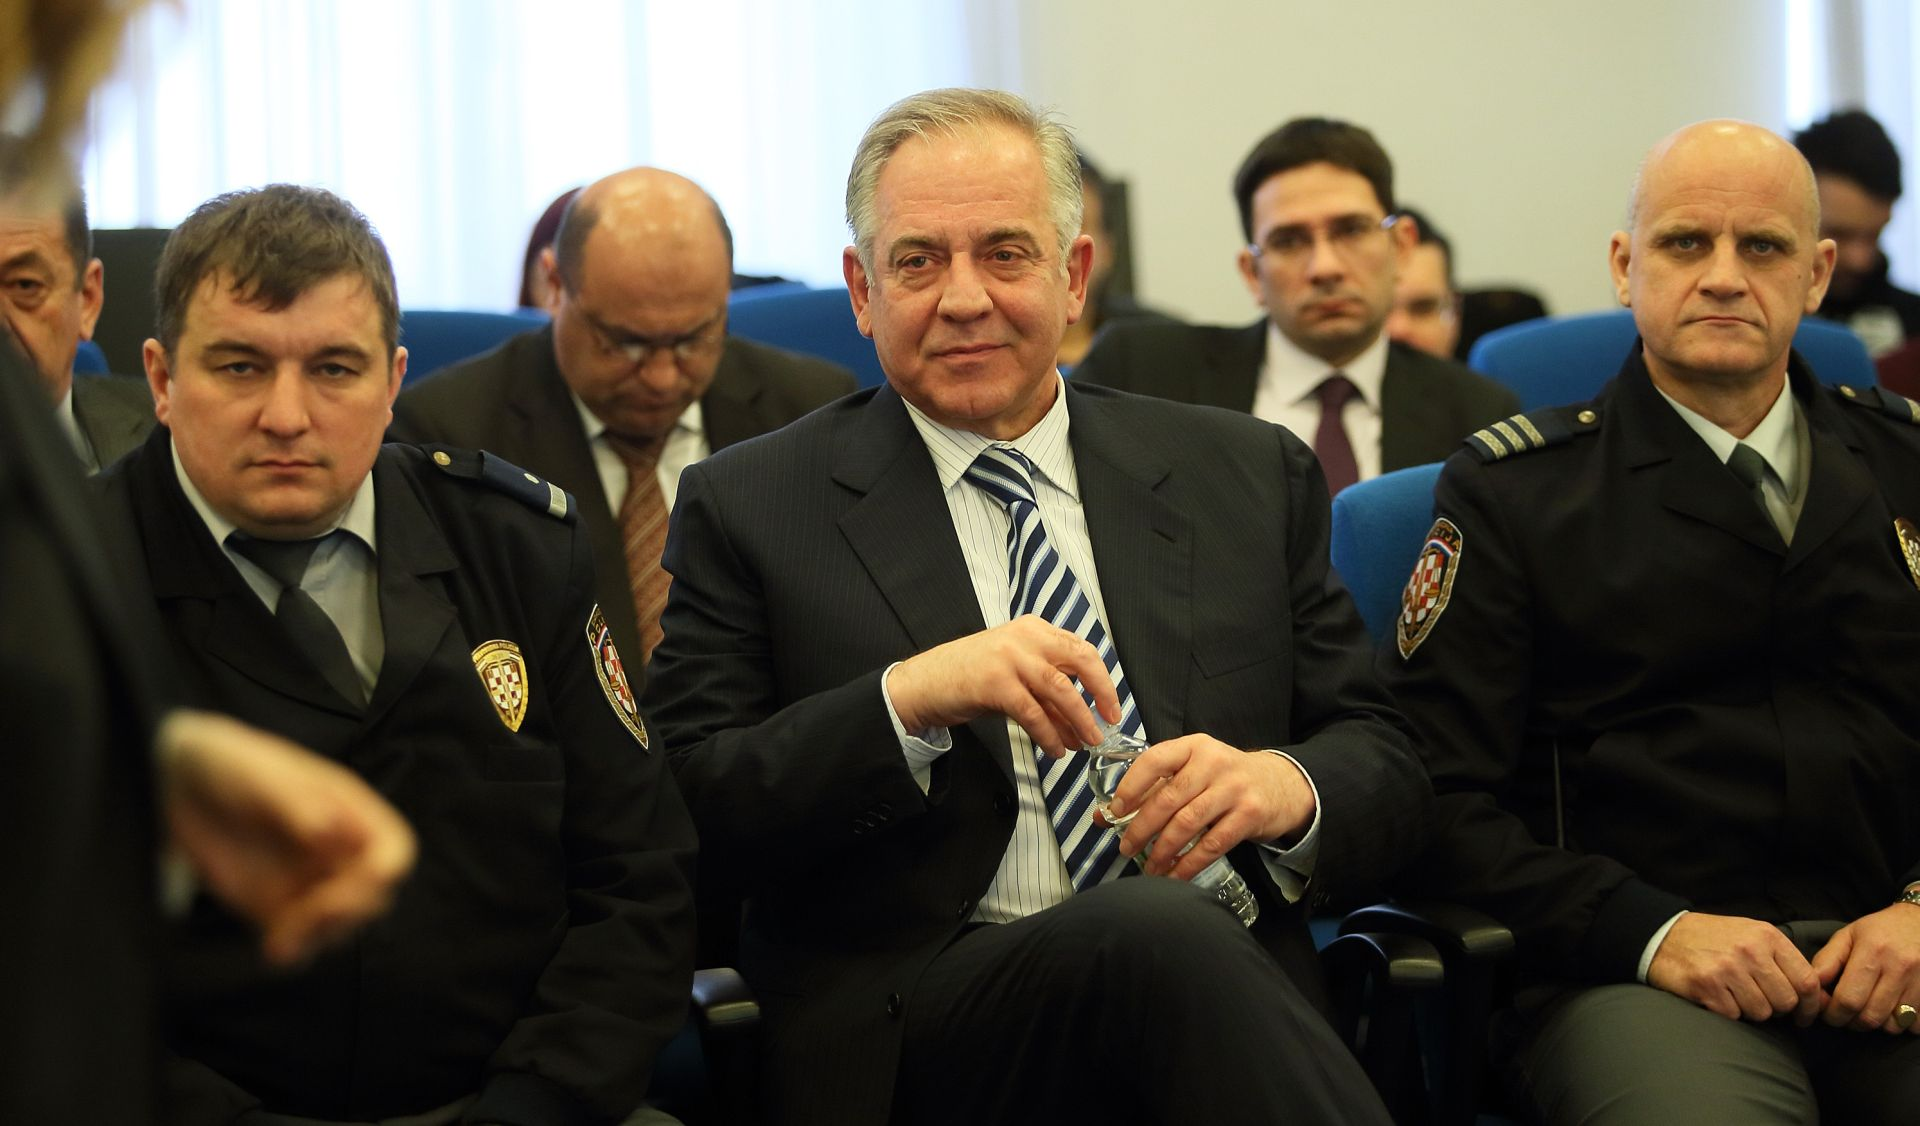 SLUČAJ PLANINSKA: Sanader ponovno proziva Kosor i Čobankovića